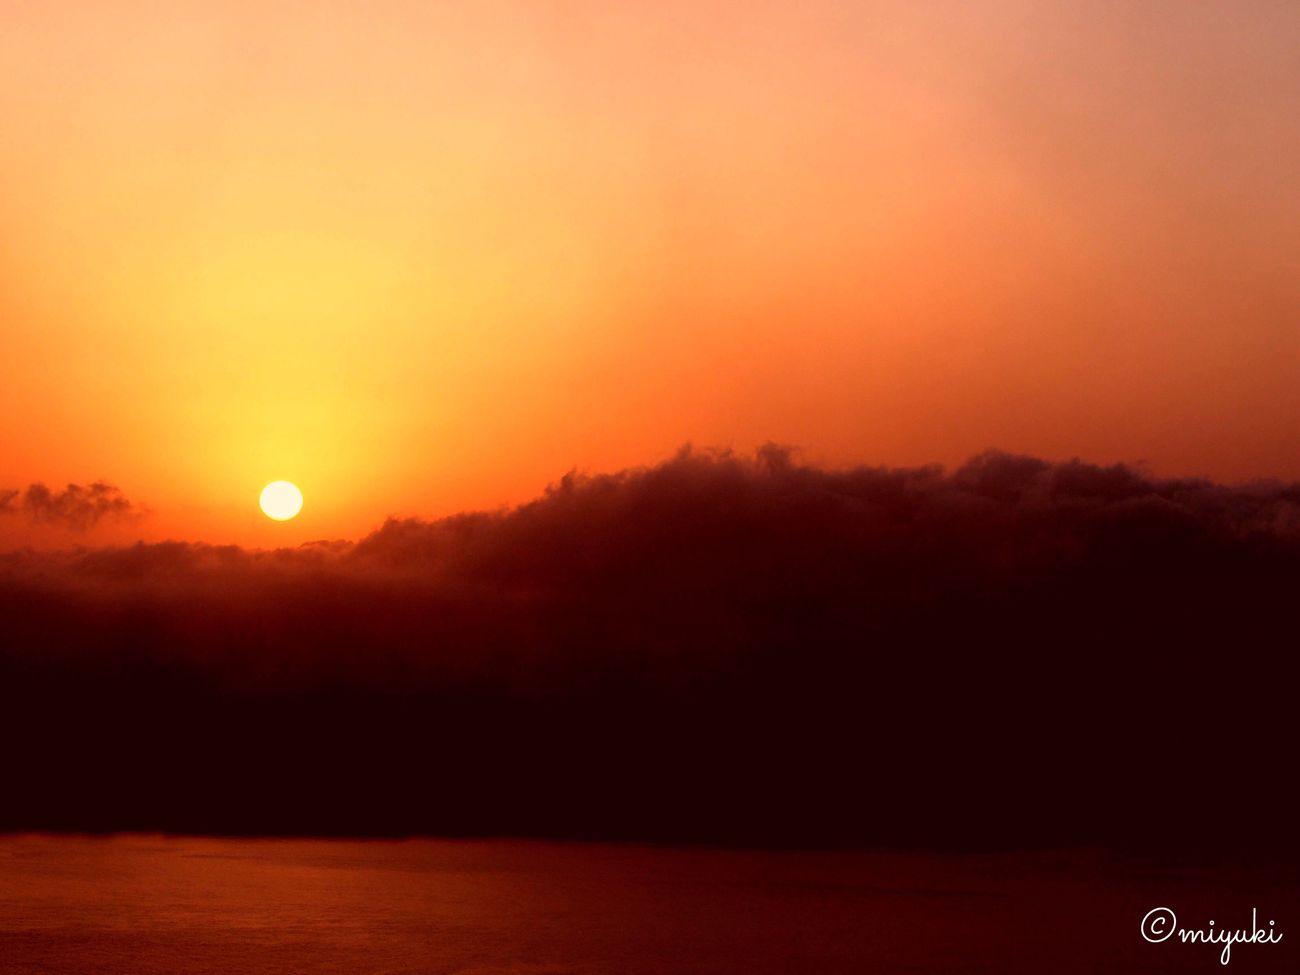 Sunset from Mt.Hakodate. Sunset Dusk EyeEm Best Shots Sunset_collection Sunset #sun #clouds #skylovers #sky #nature #beautifulinnature #naturalbeauty #photography #landscape Sunset Lovers